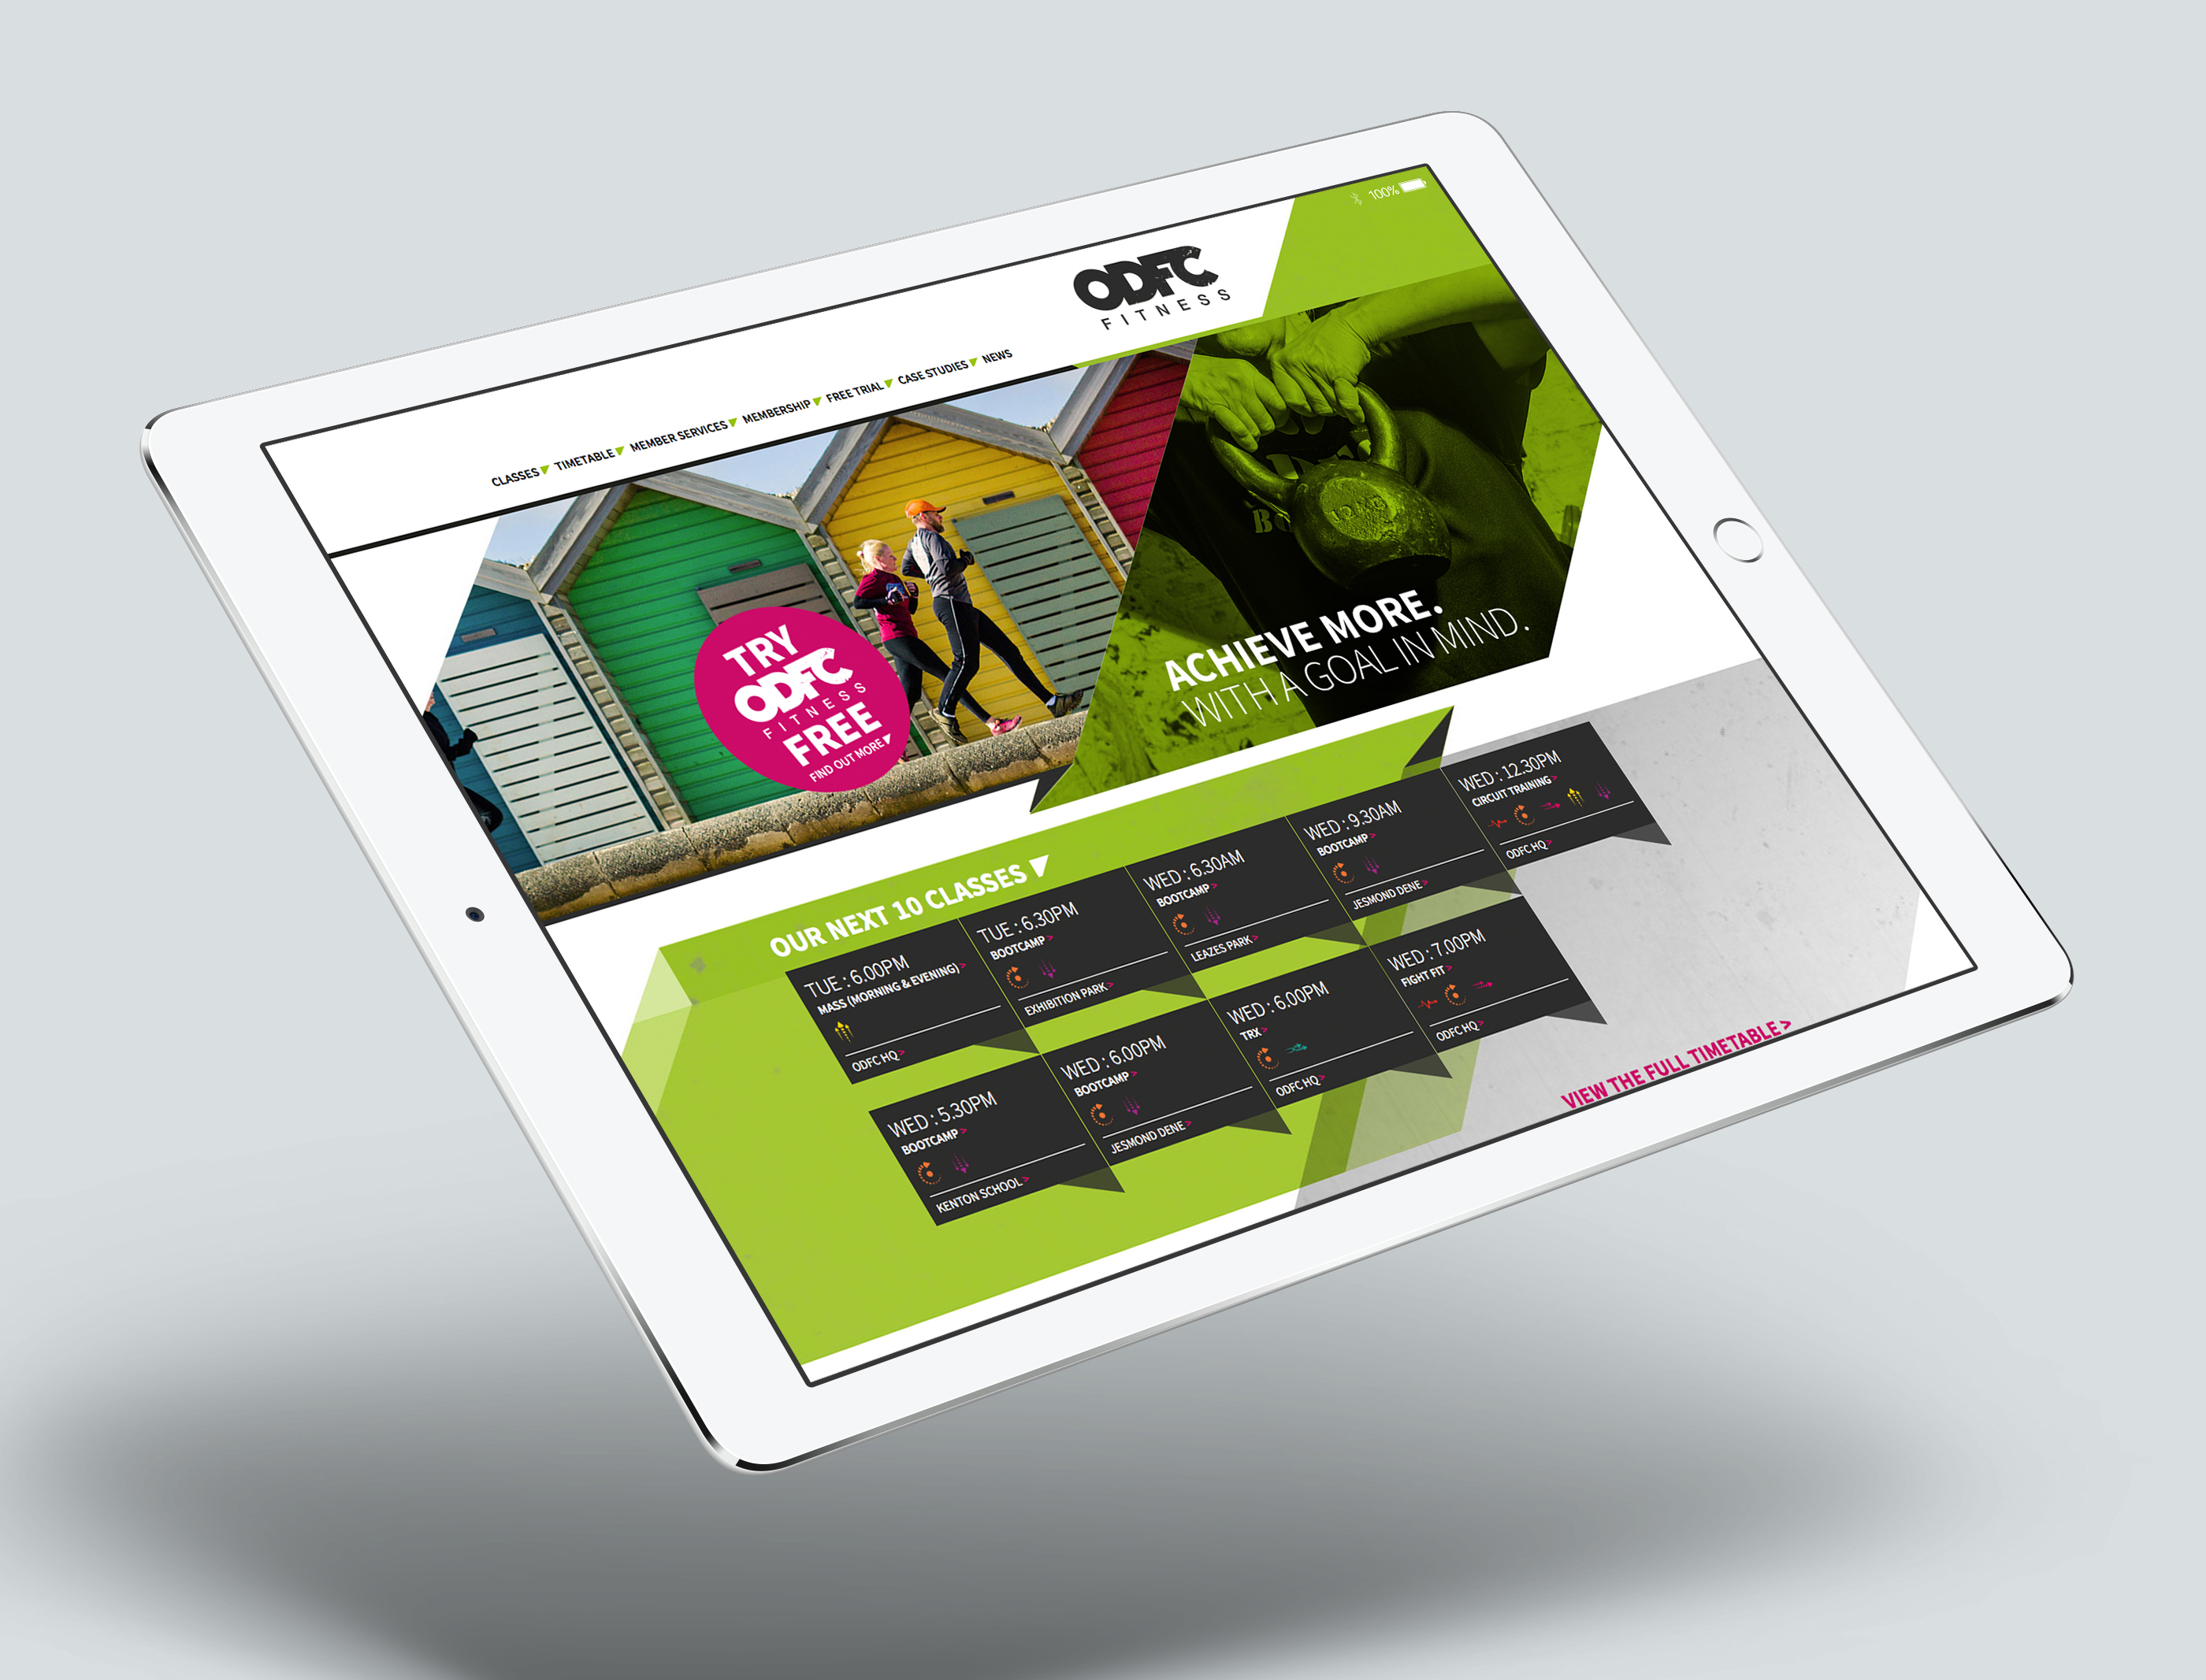 ODFC-website-1